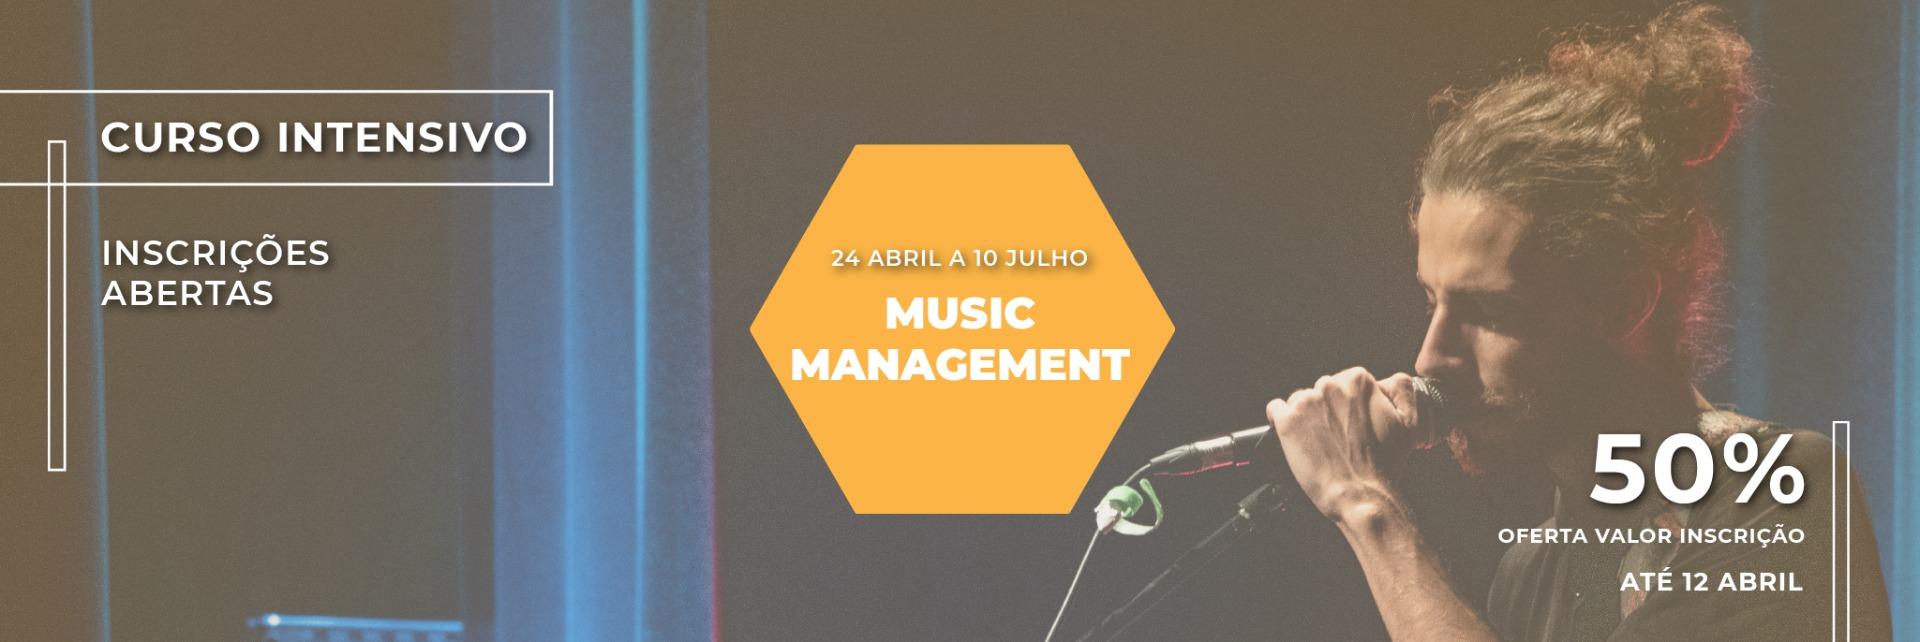 Curso Intensivo Music Management